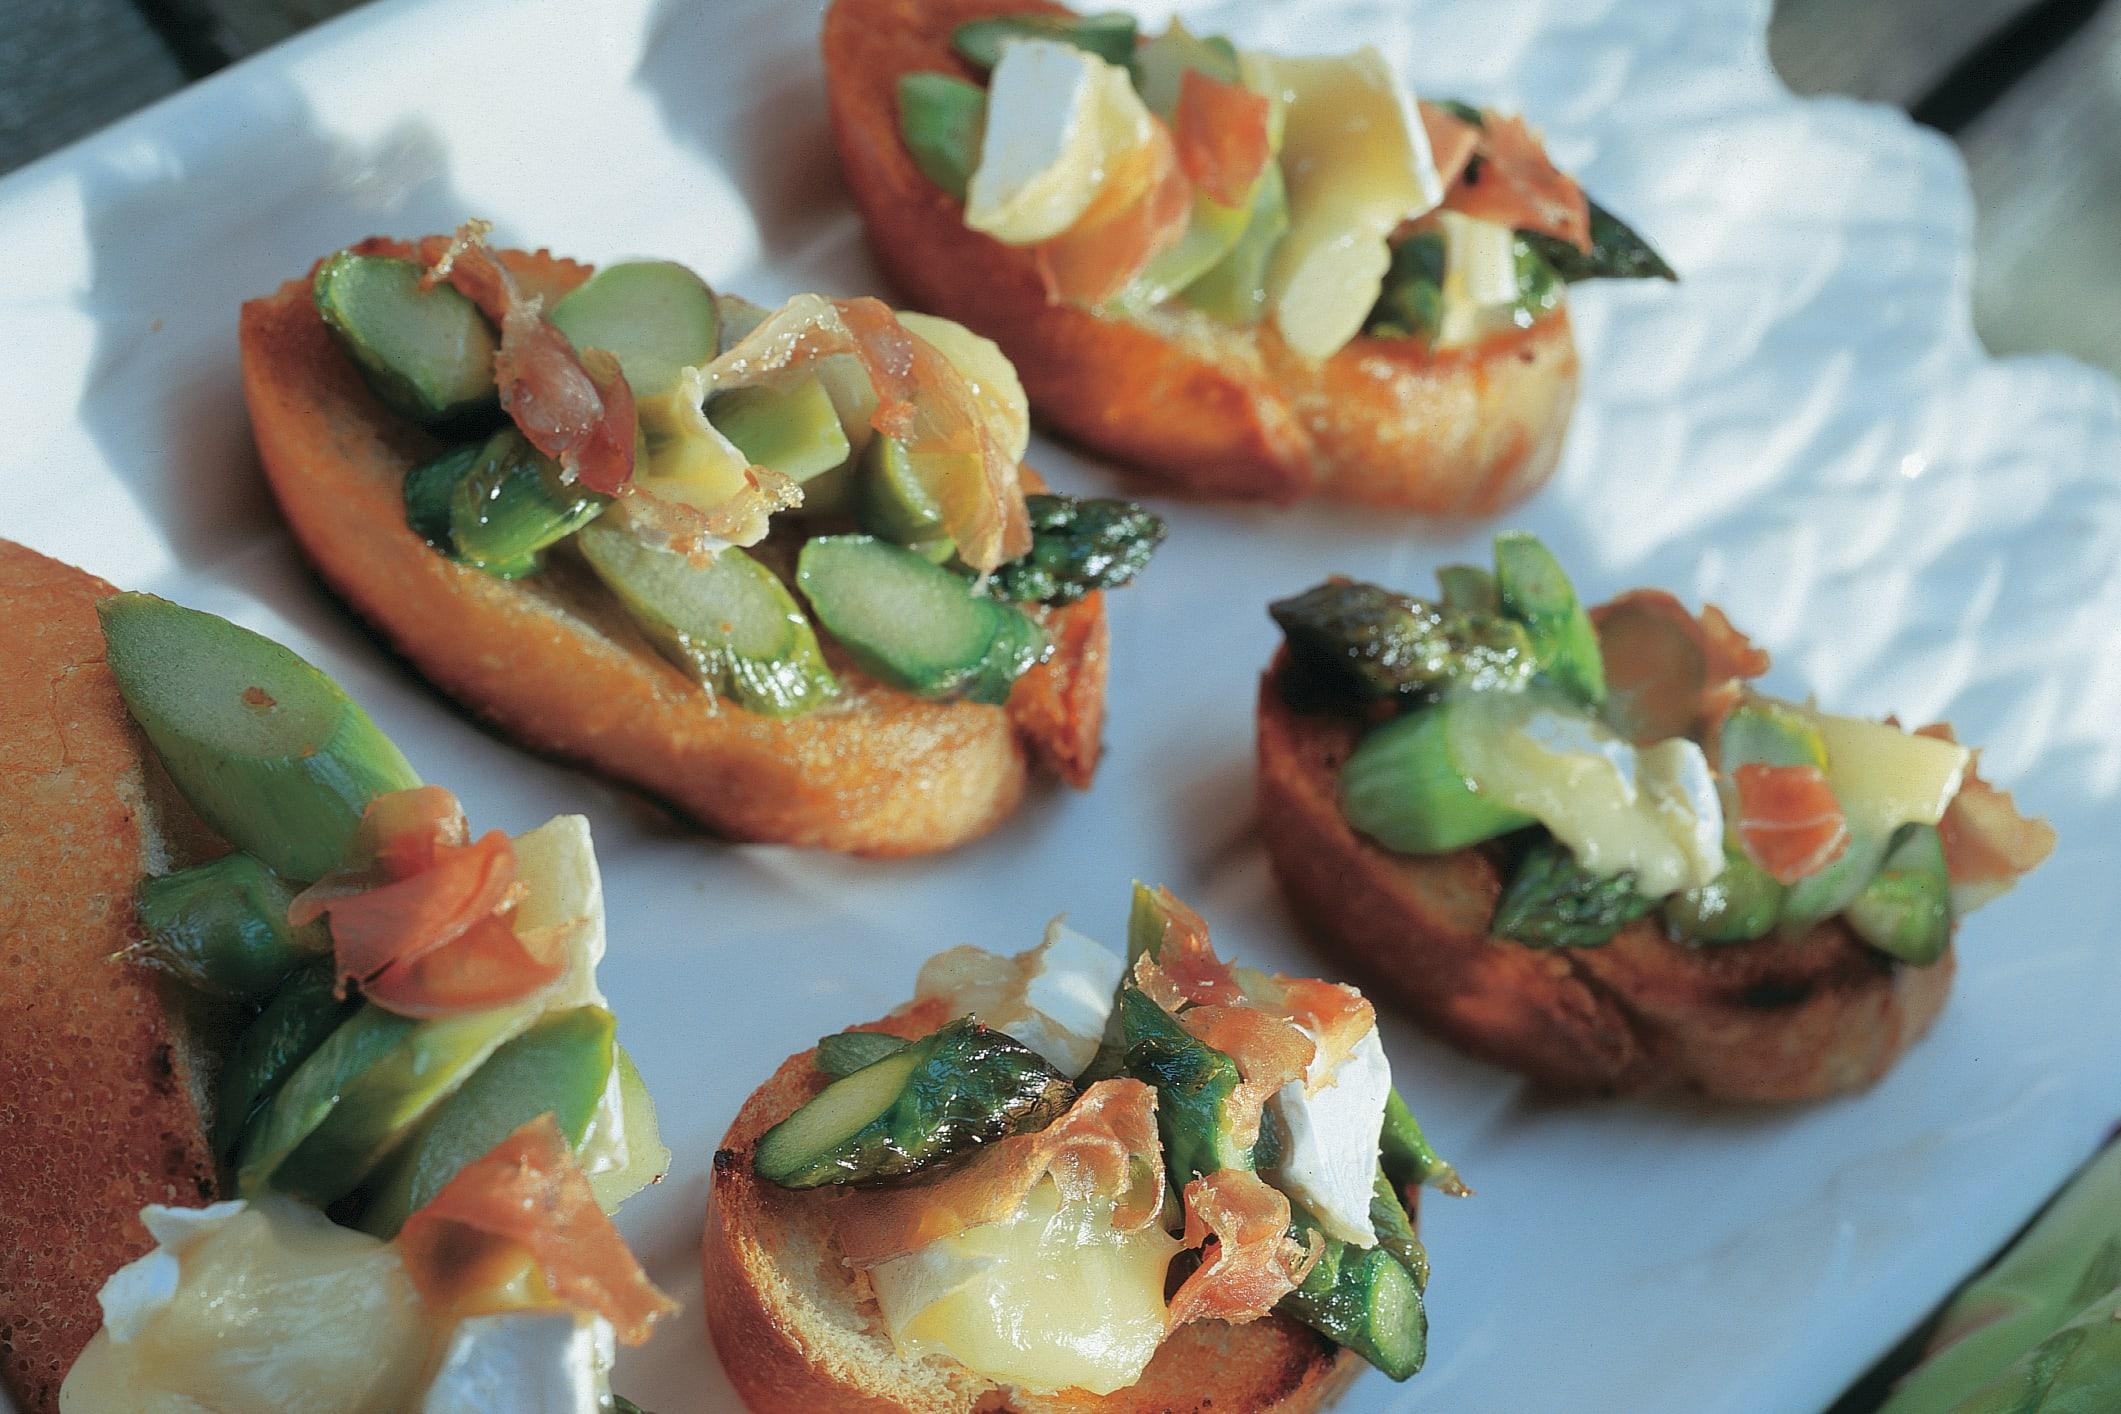 Crostini aux asperges, au camembert et au jambon